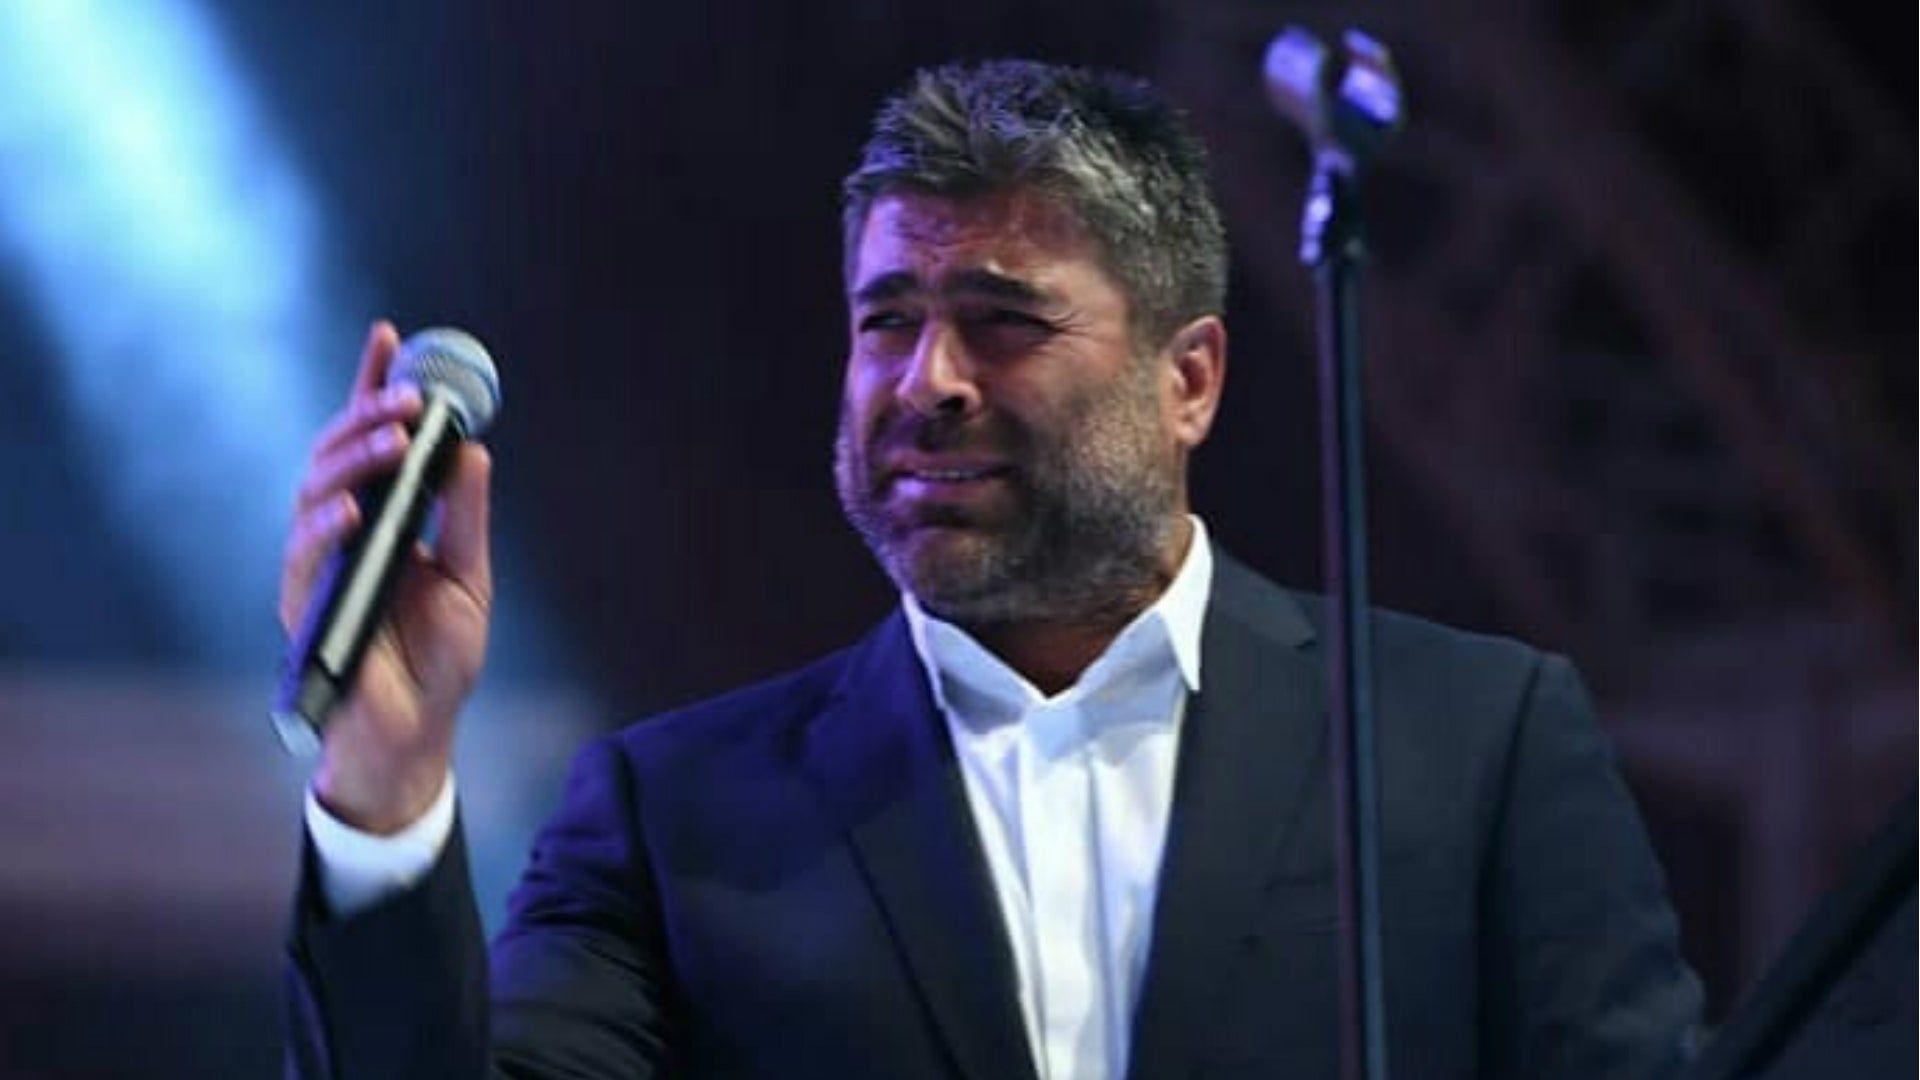 Wael Kfoury Breaks His Silence On Crisis With Ex Wife Wael Kfoury Ex Wives Silence